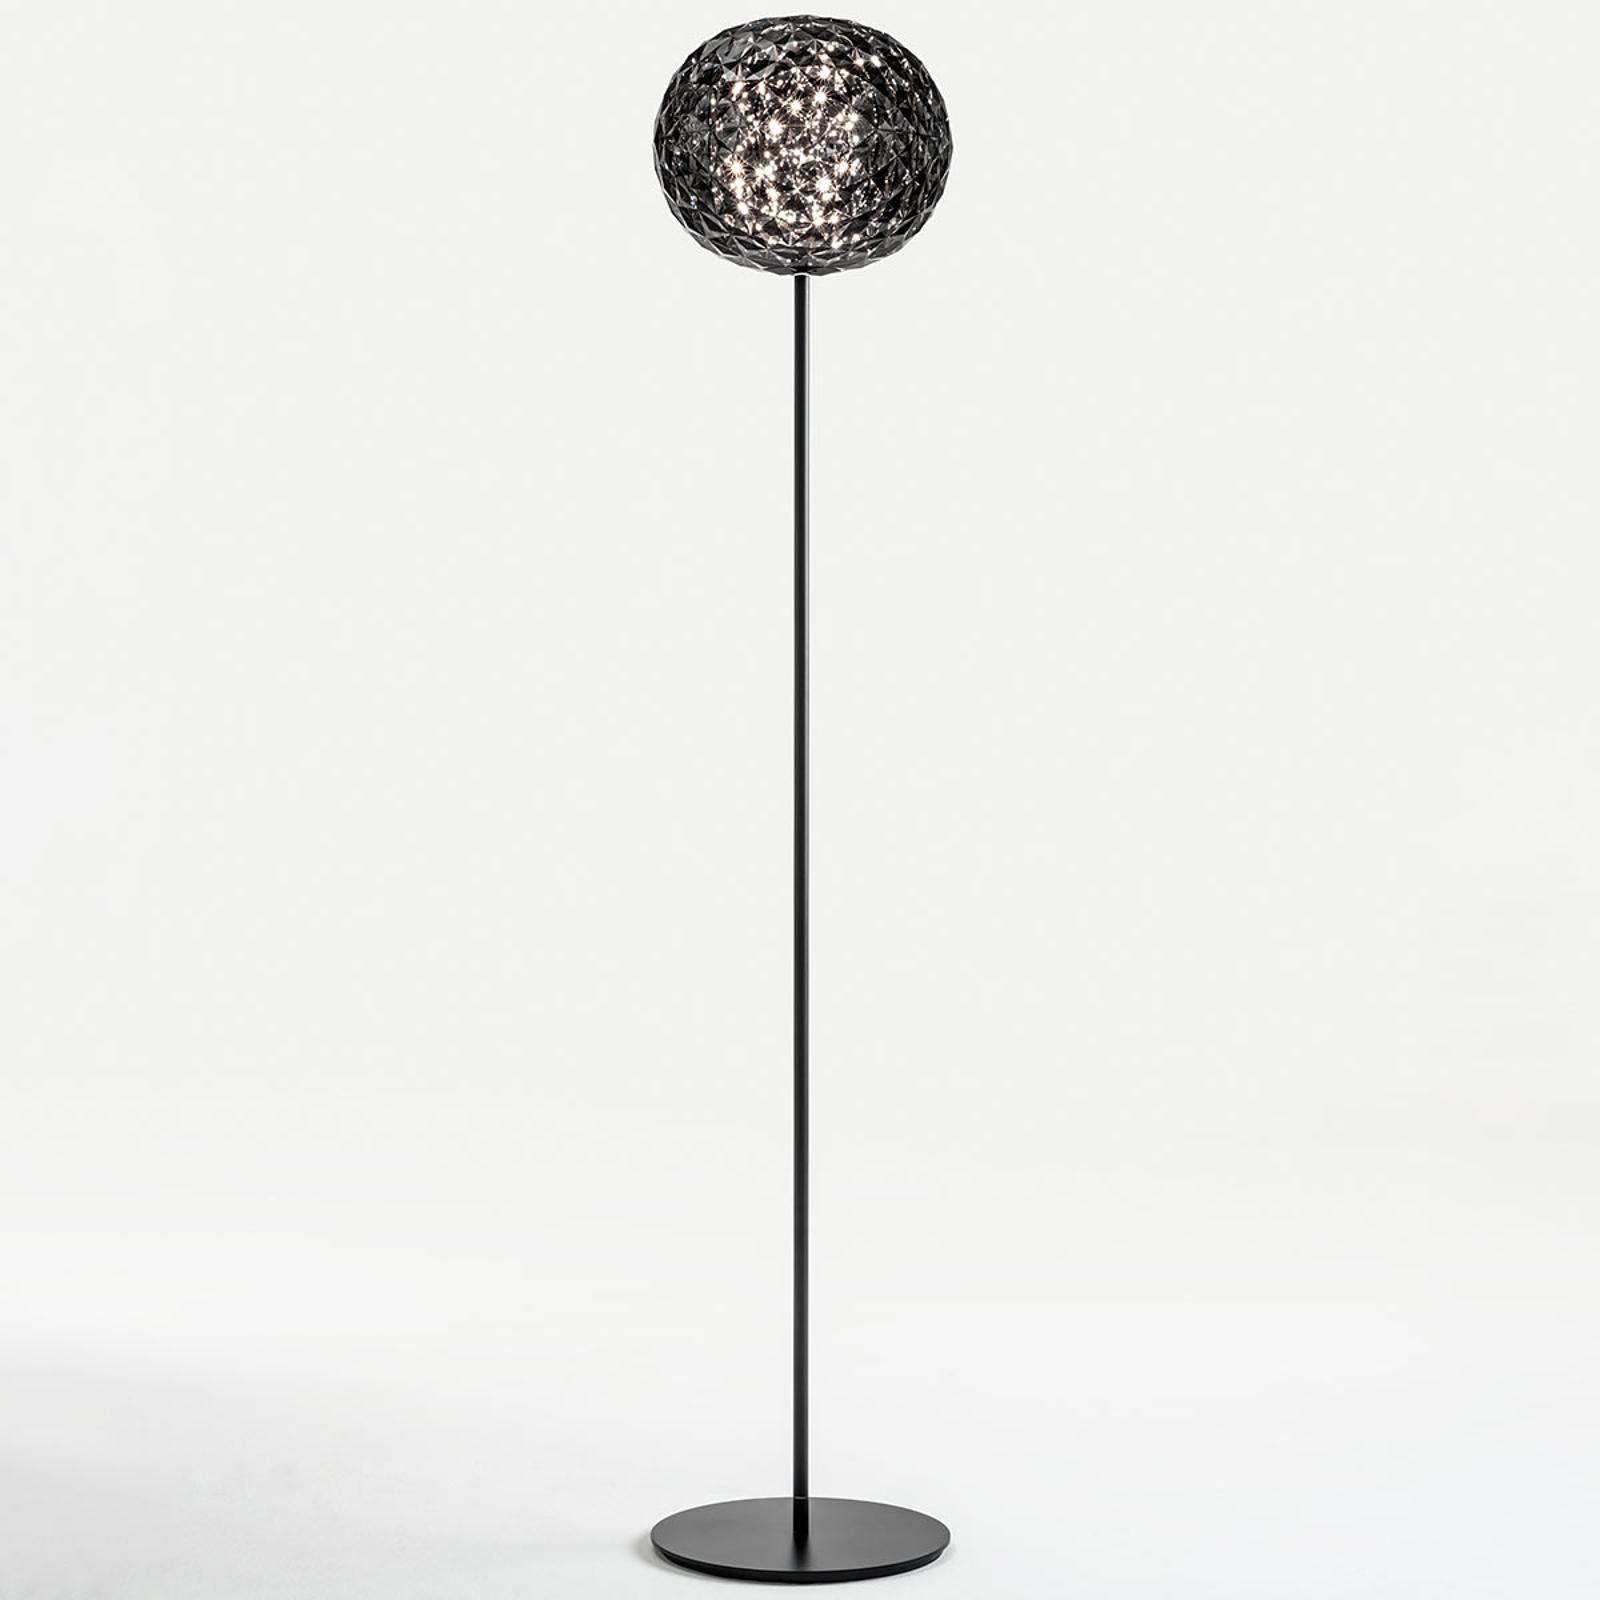 Kartell Planet LED-Stehleuchte 160cm rauchgrau